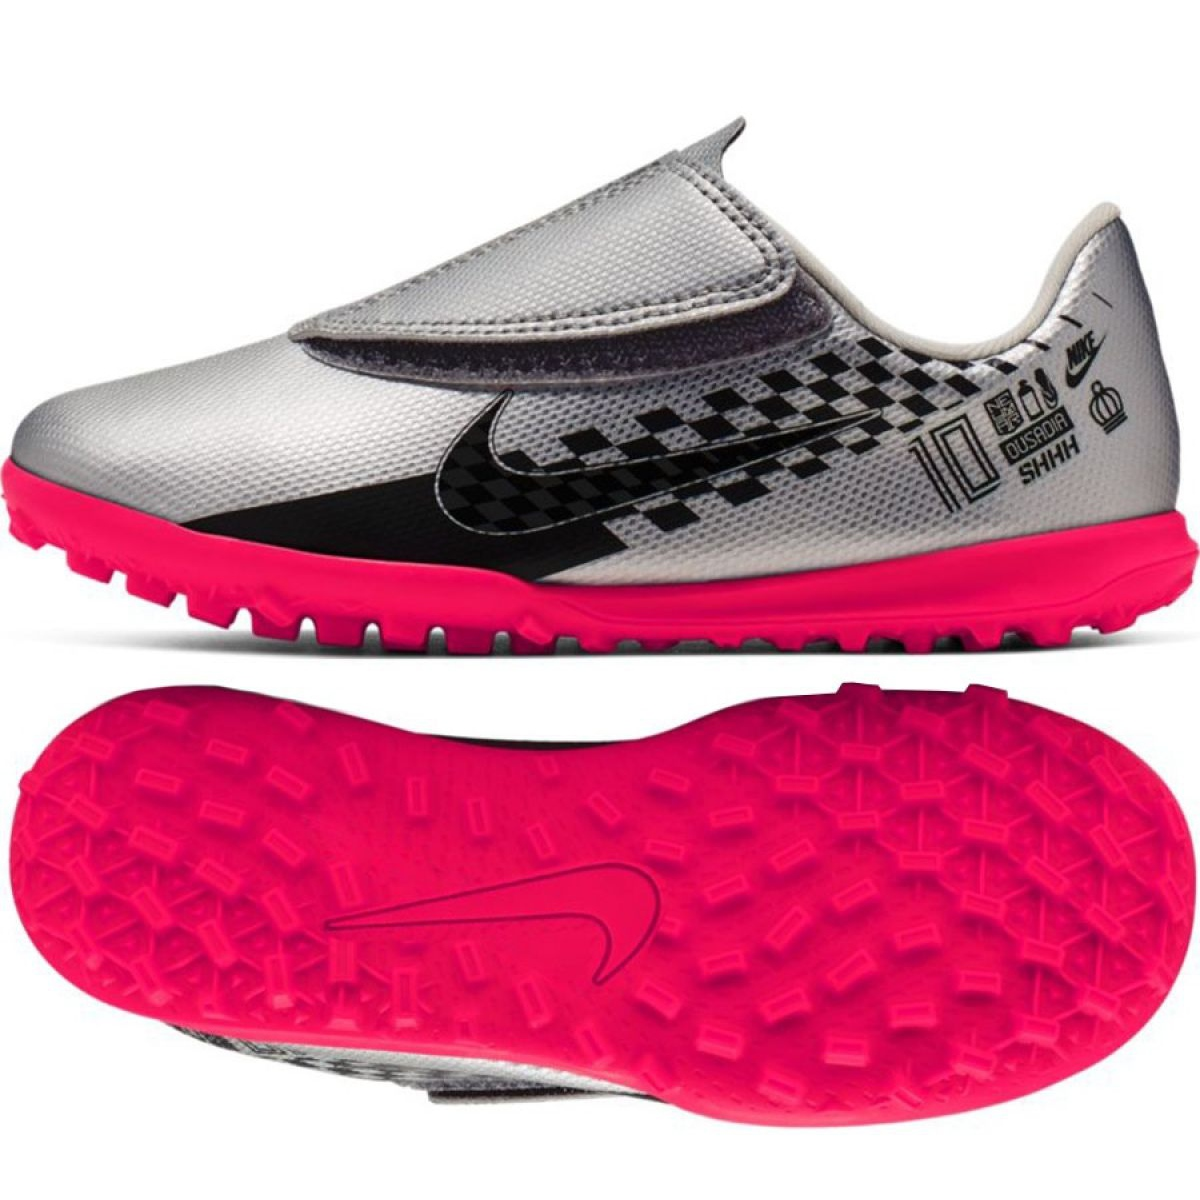 gene Galantería Asombrosamente  Nike Mercurial Vapor 13 Club Tf Neymar Jr AT8176 006 shoes grey ...